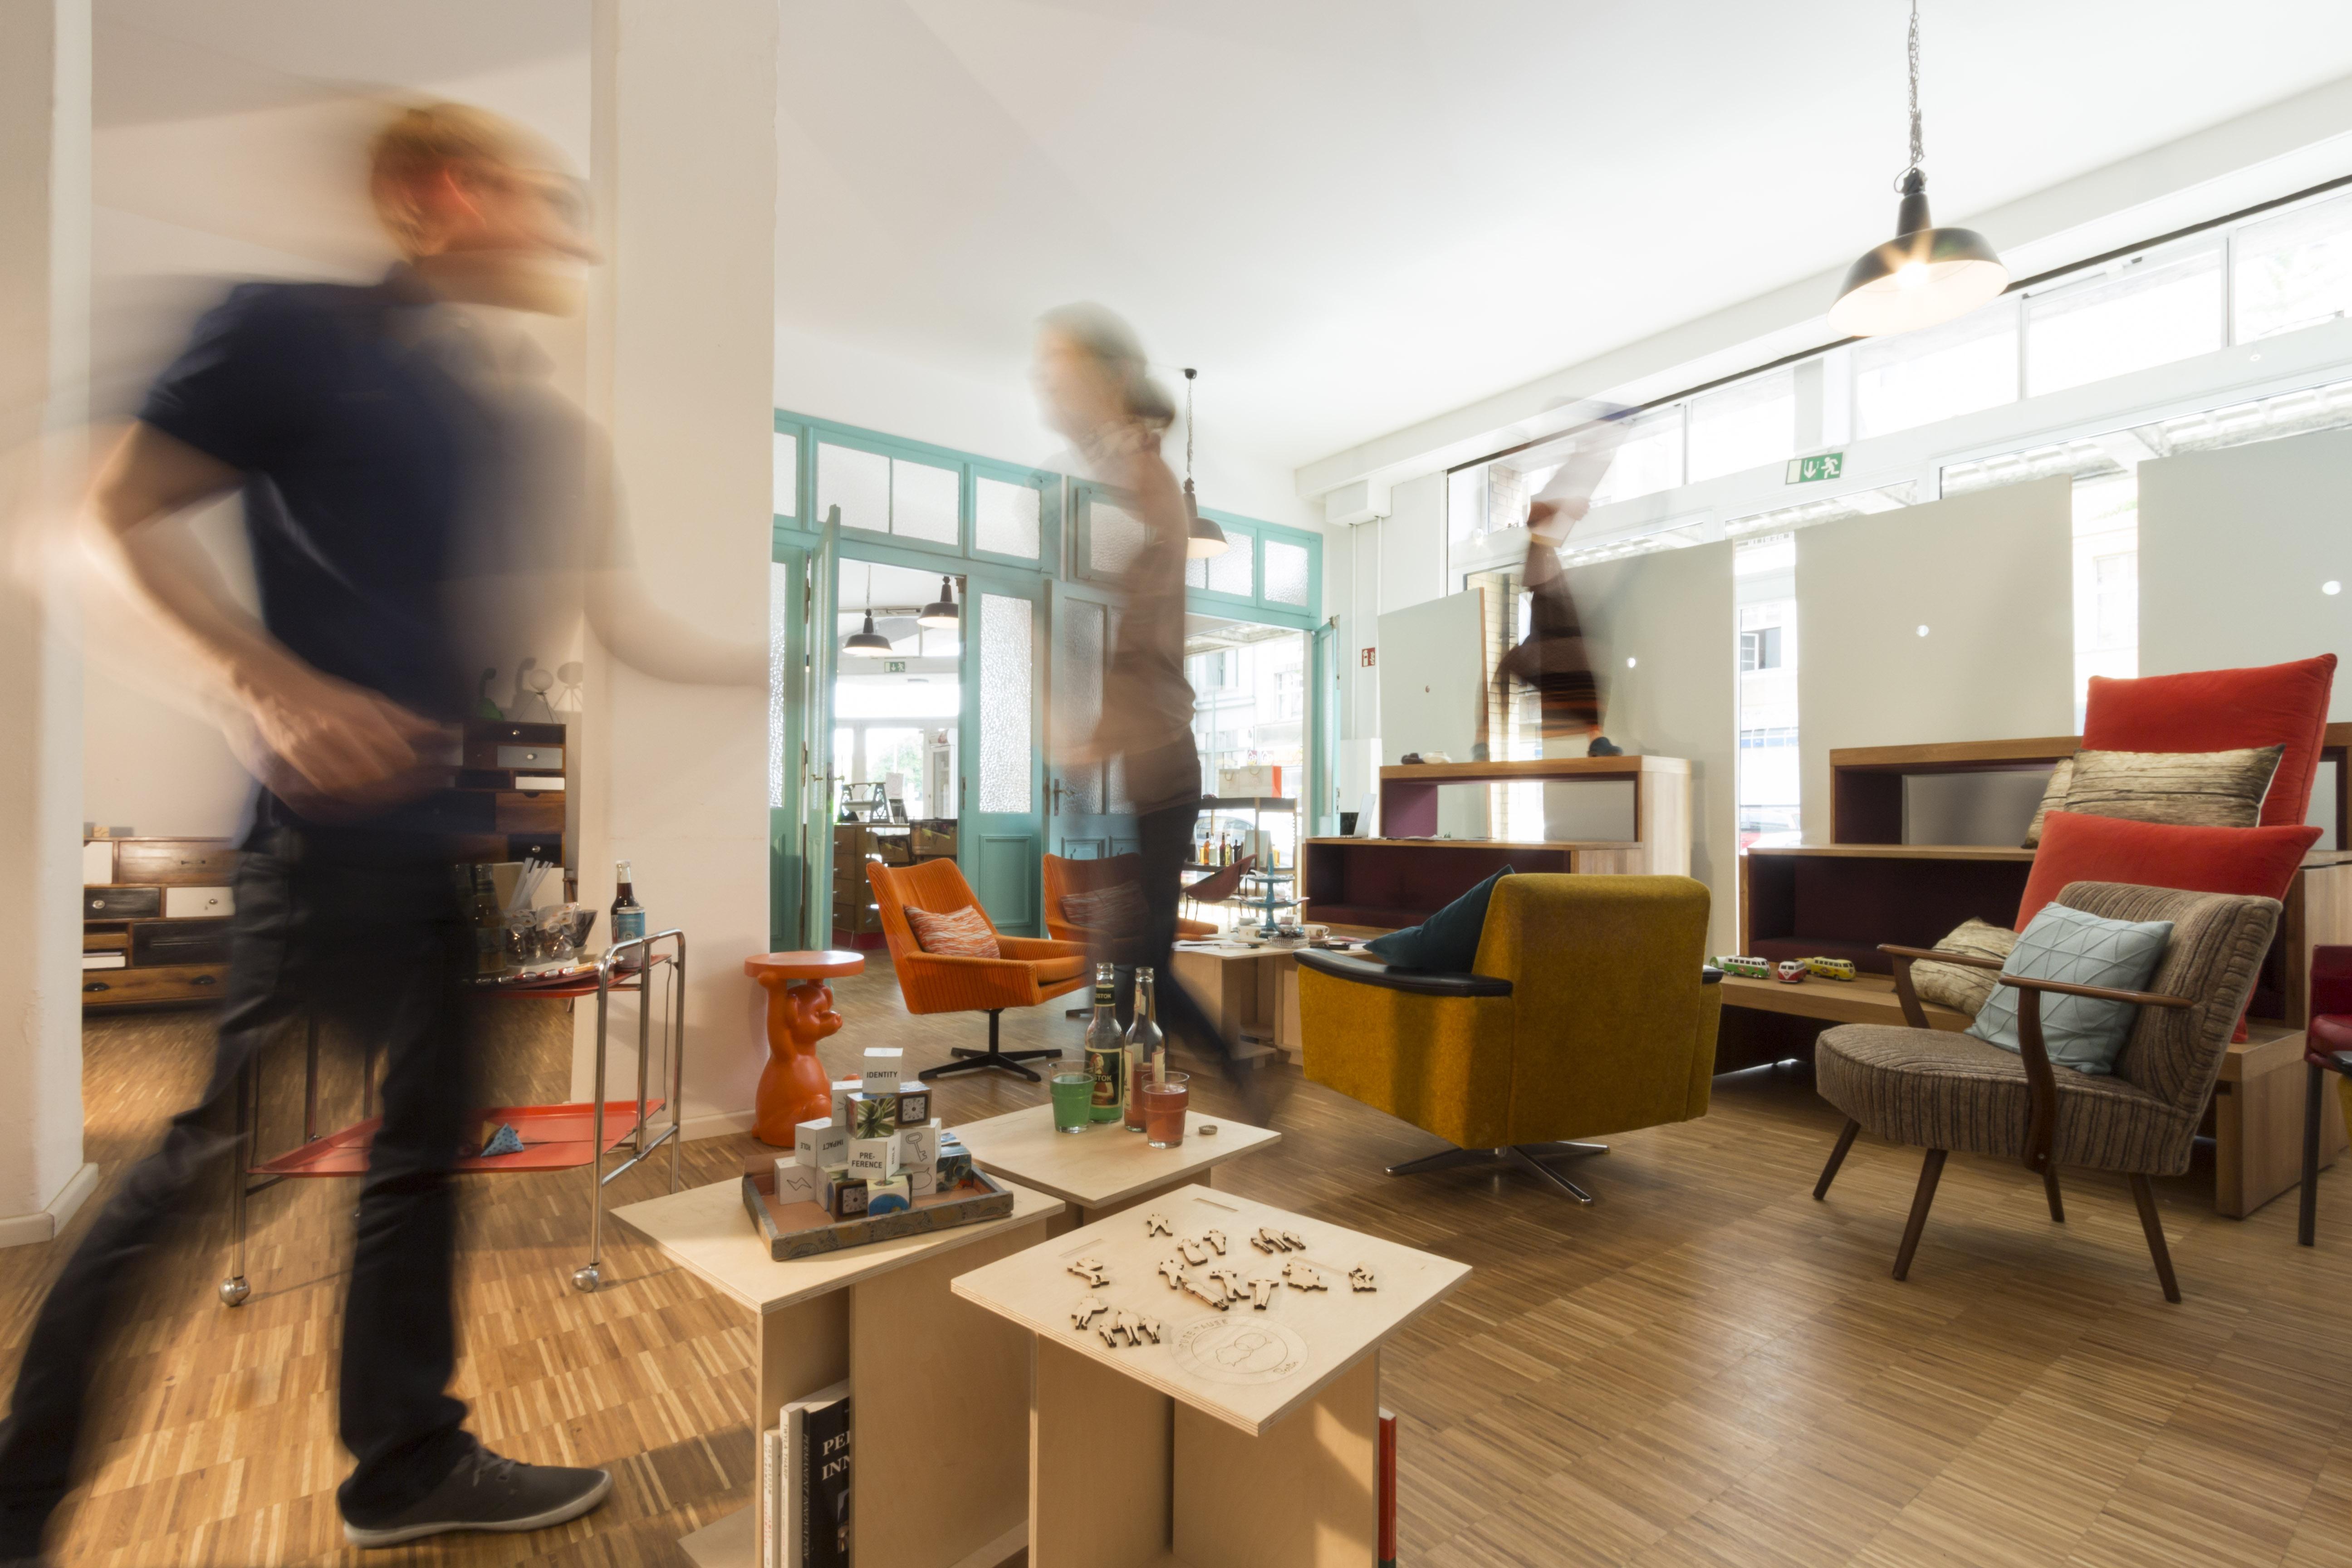 Pure pause berlin kreativen workshopraum seminarraum mieten for Raumgestaltung ideen buro